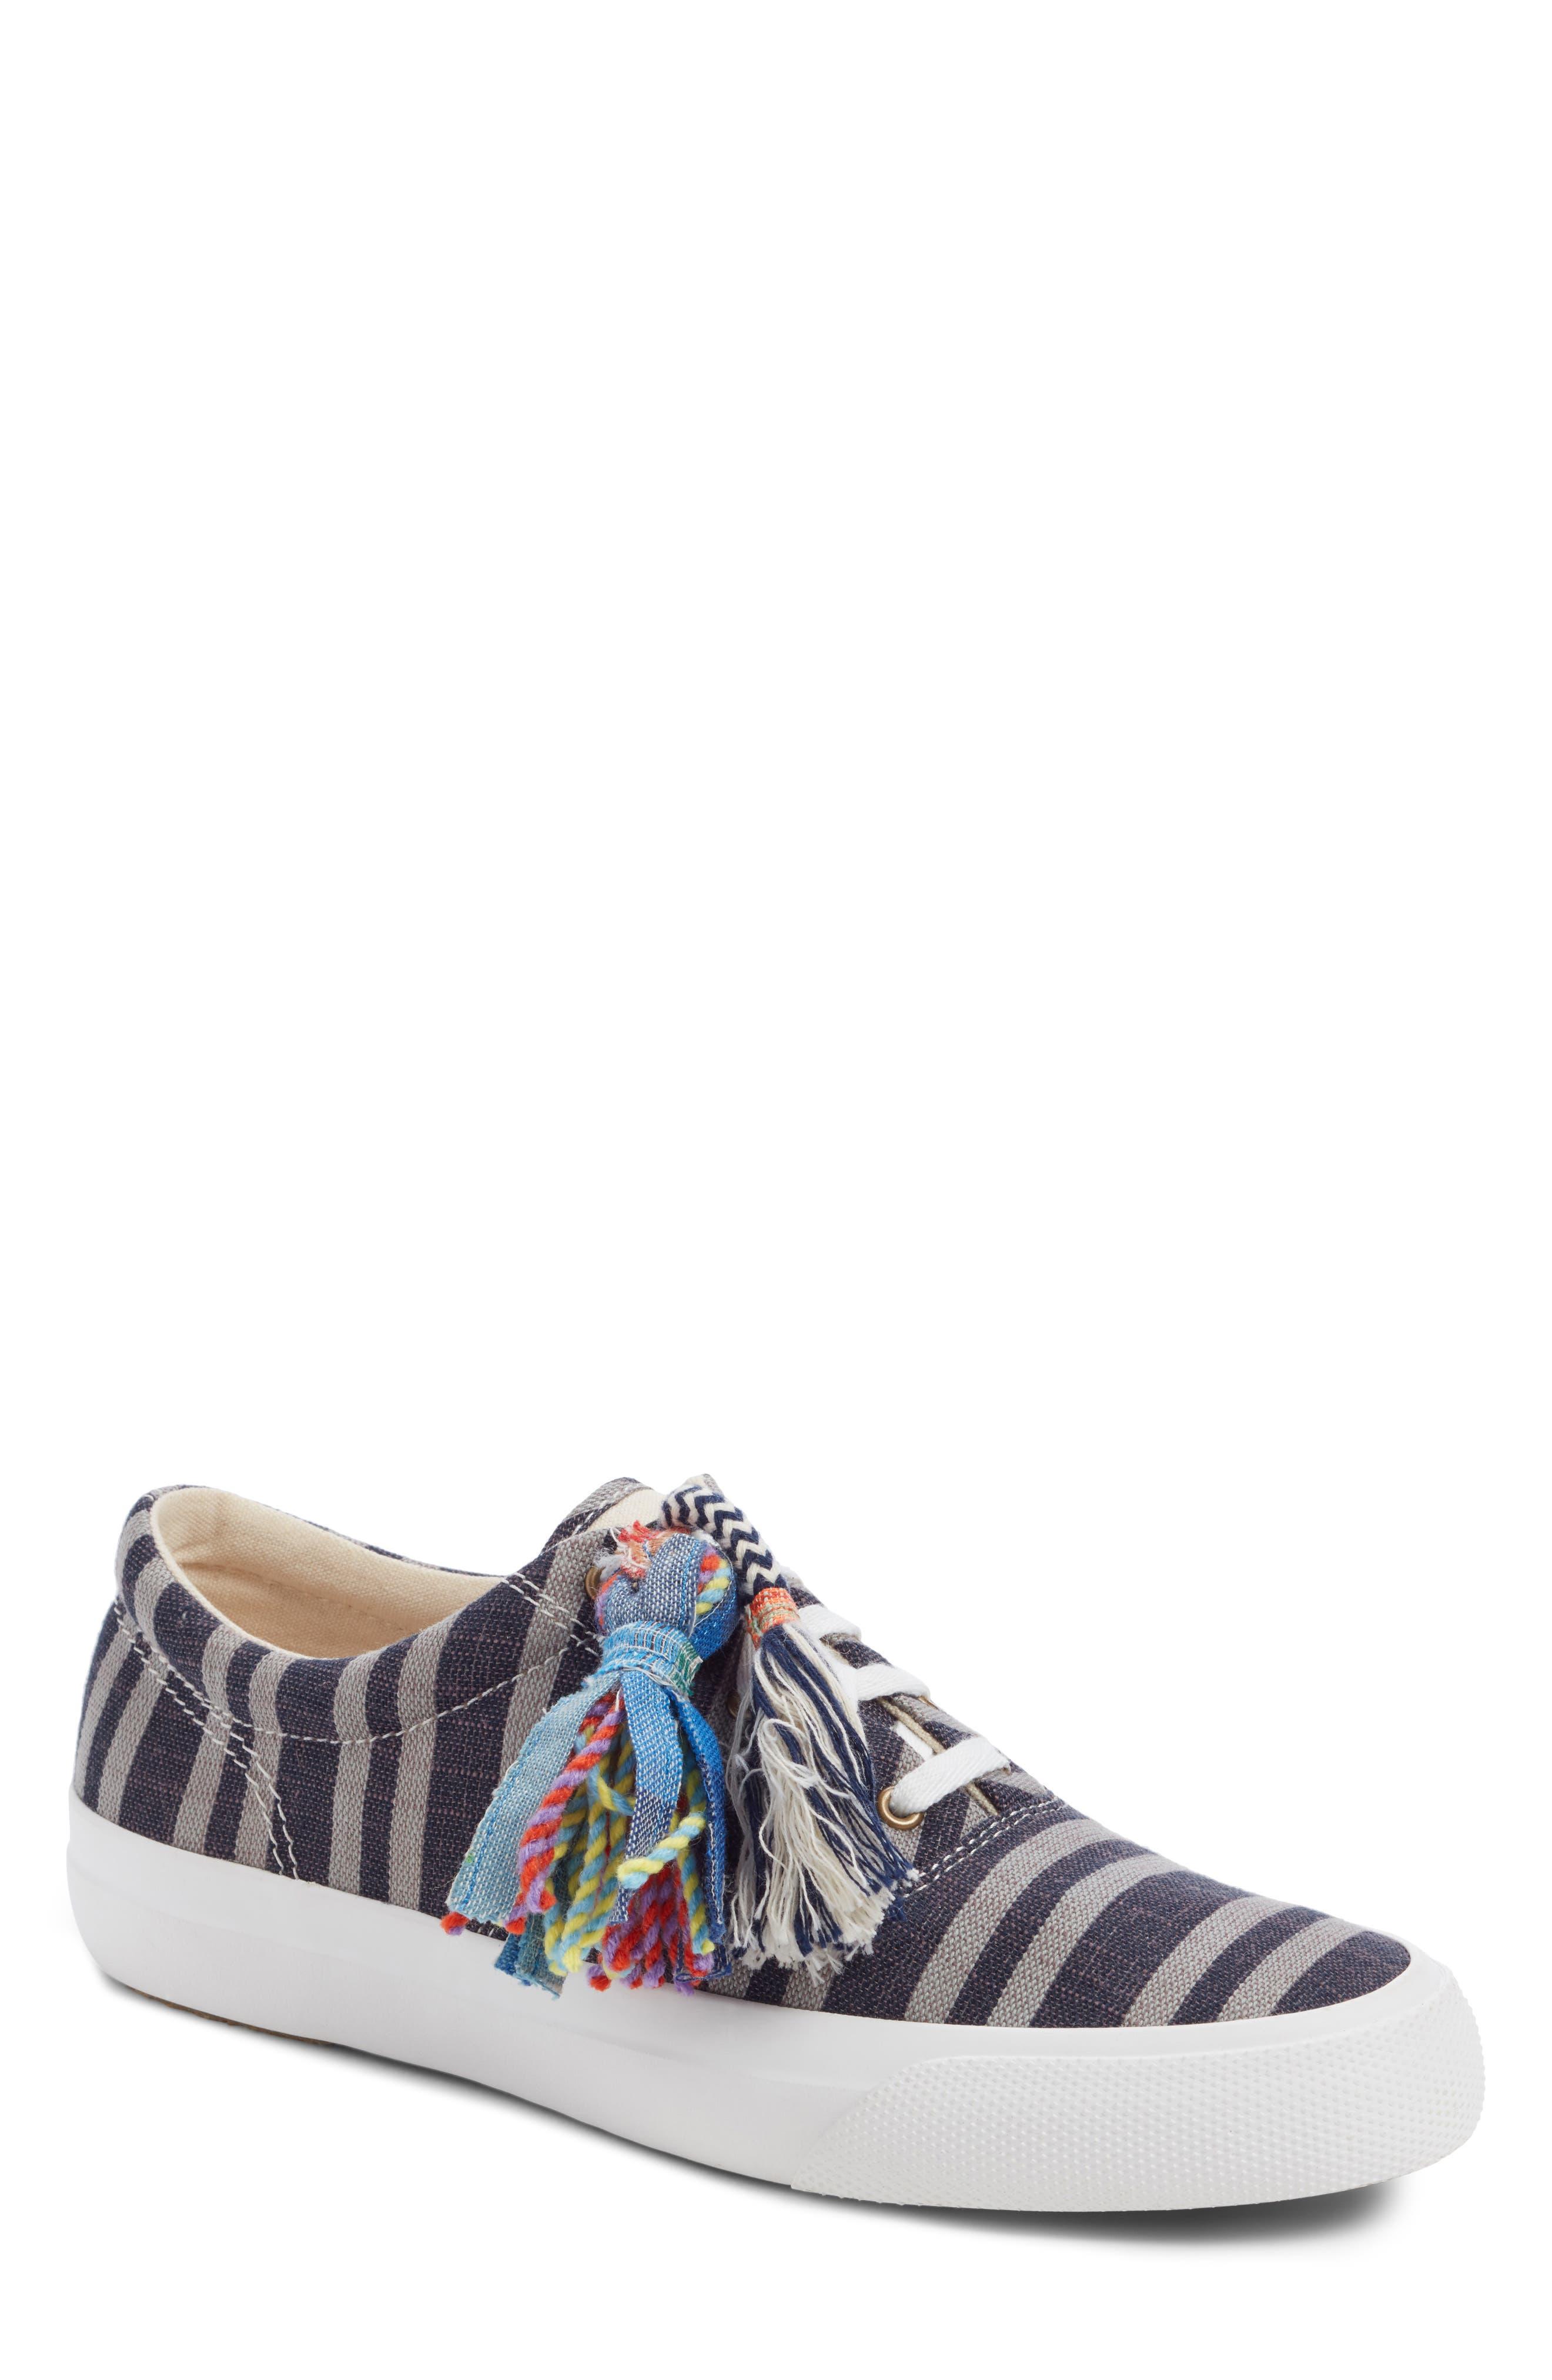 Keds x Ace & Jig Anchor Channel Sneaker, Main, color, BLACK MULTI